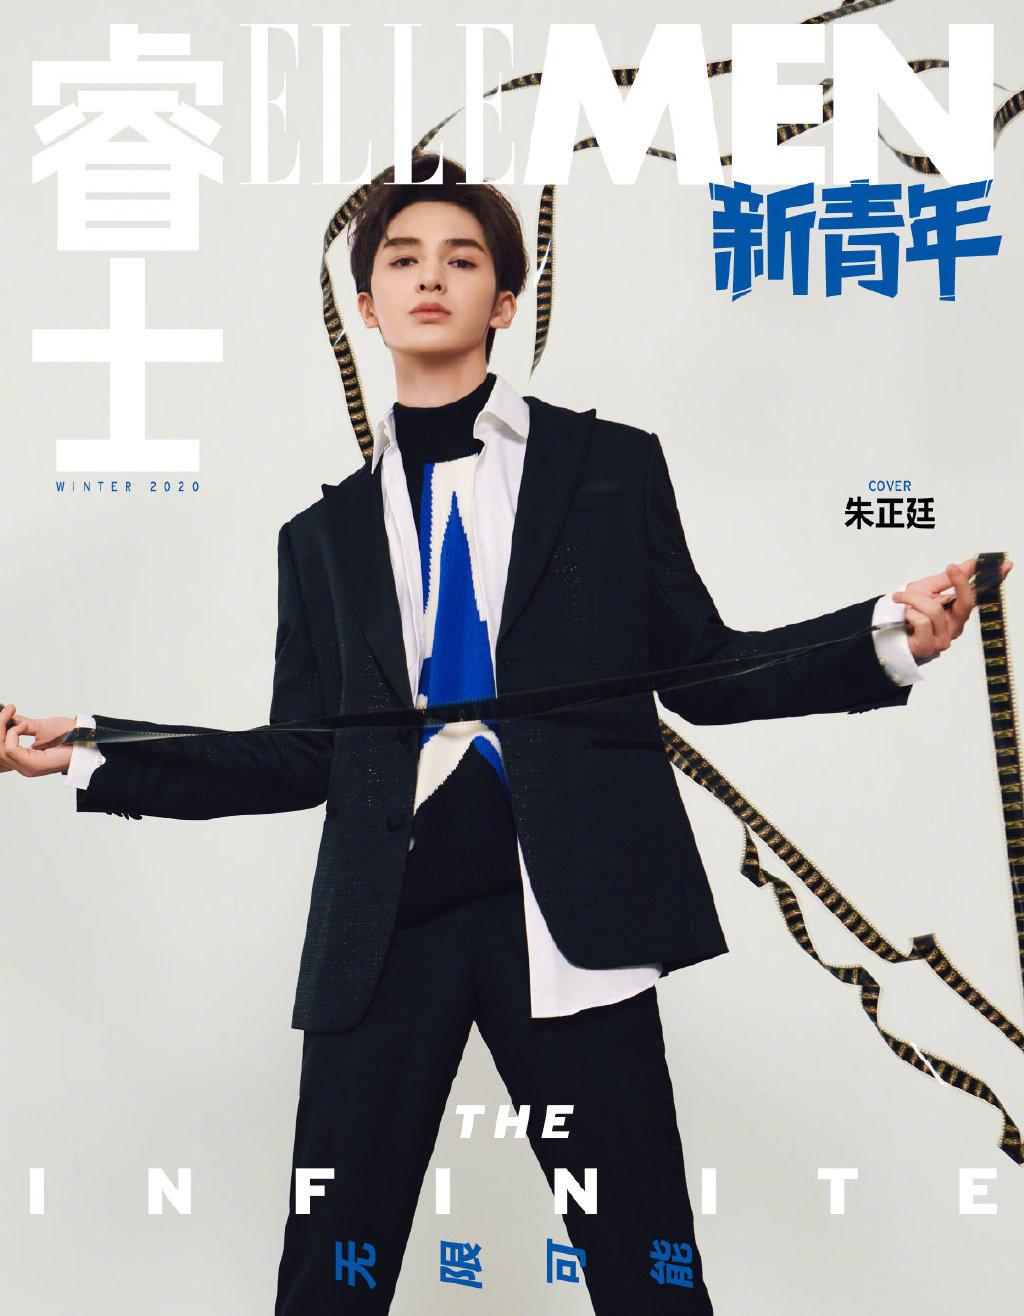 sunbet:《'朱'》正廷西服{套装登时}尚『「杂志」』 【演绎少年】的温柔与坚韧 第1张